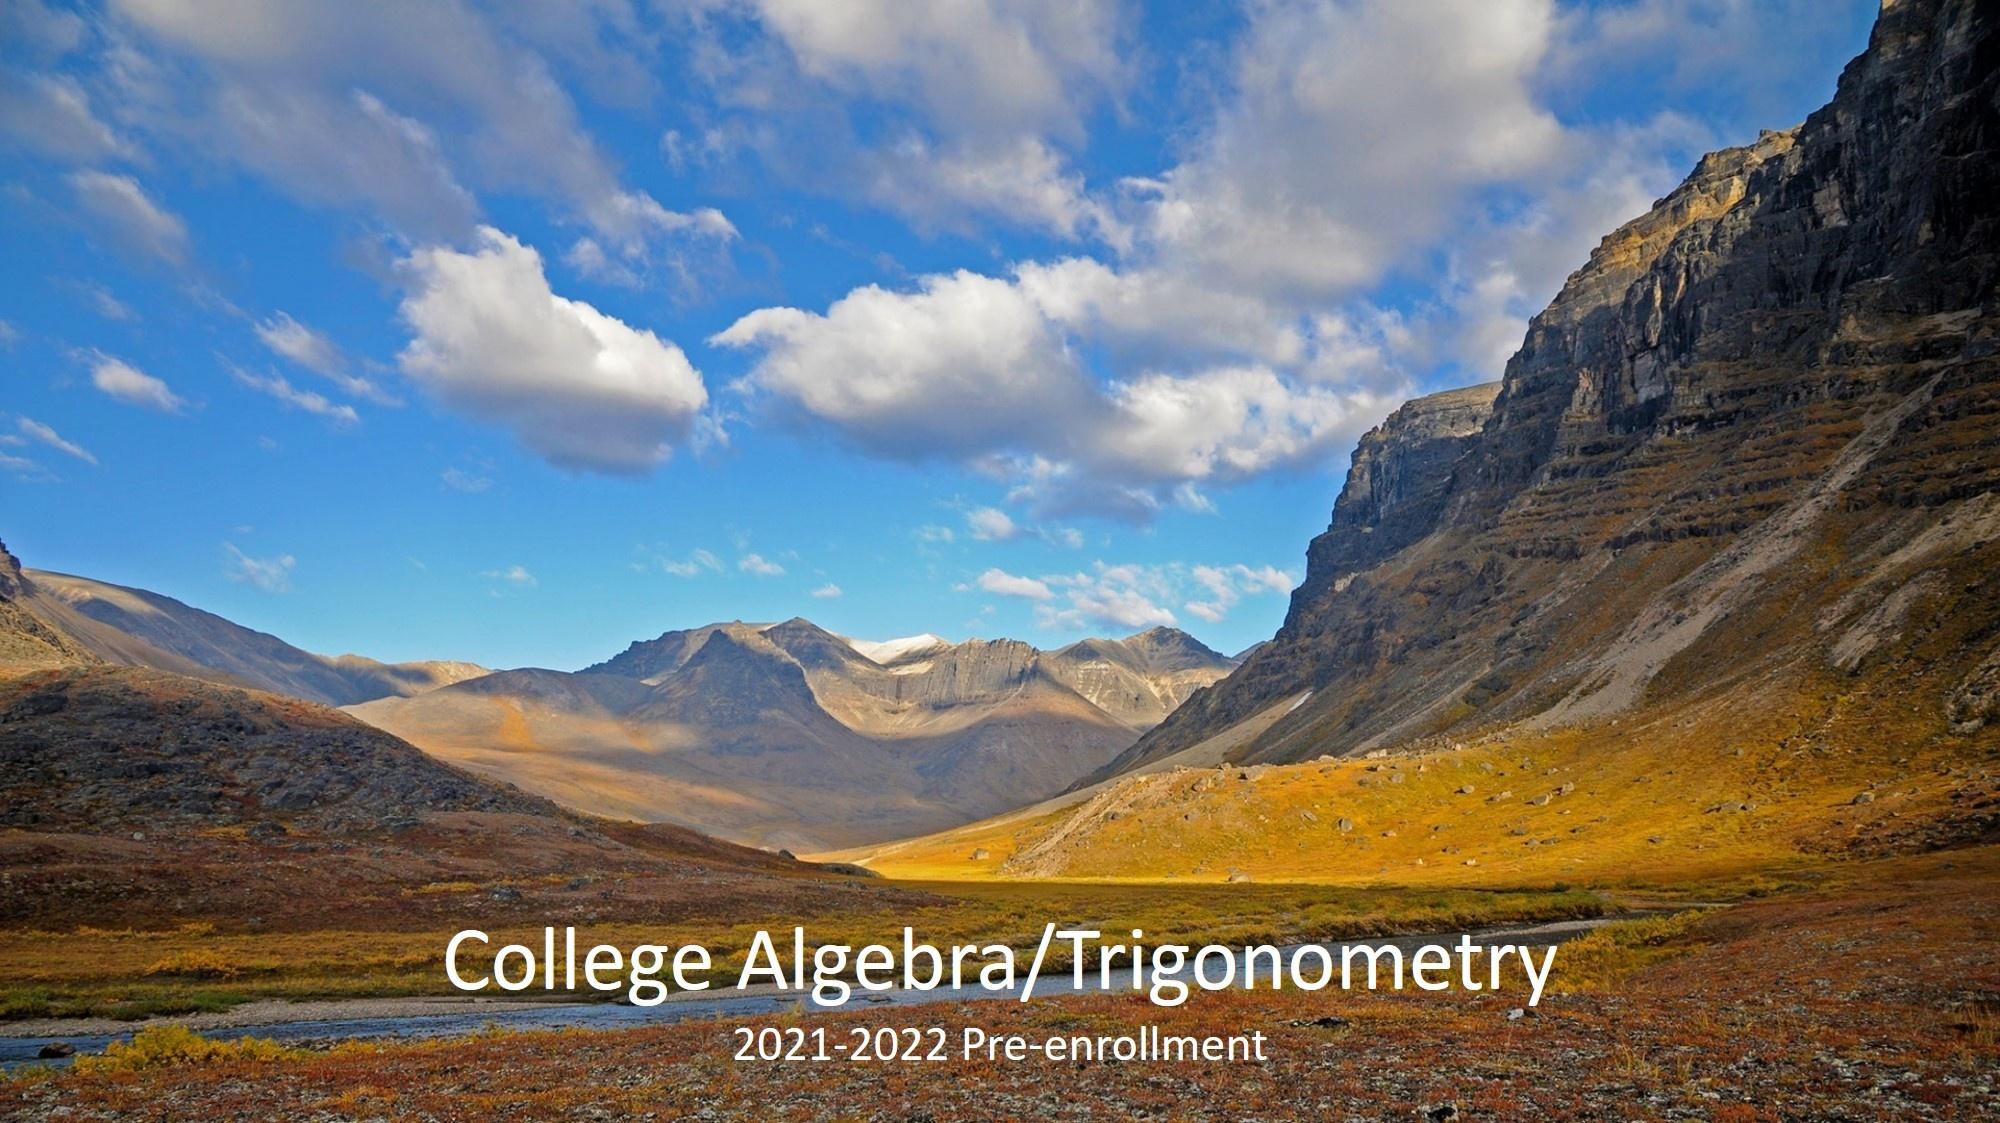 College Algebra/Trigonometry : 2021-2022 Pre-enrollment